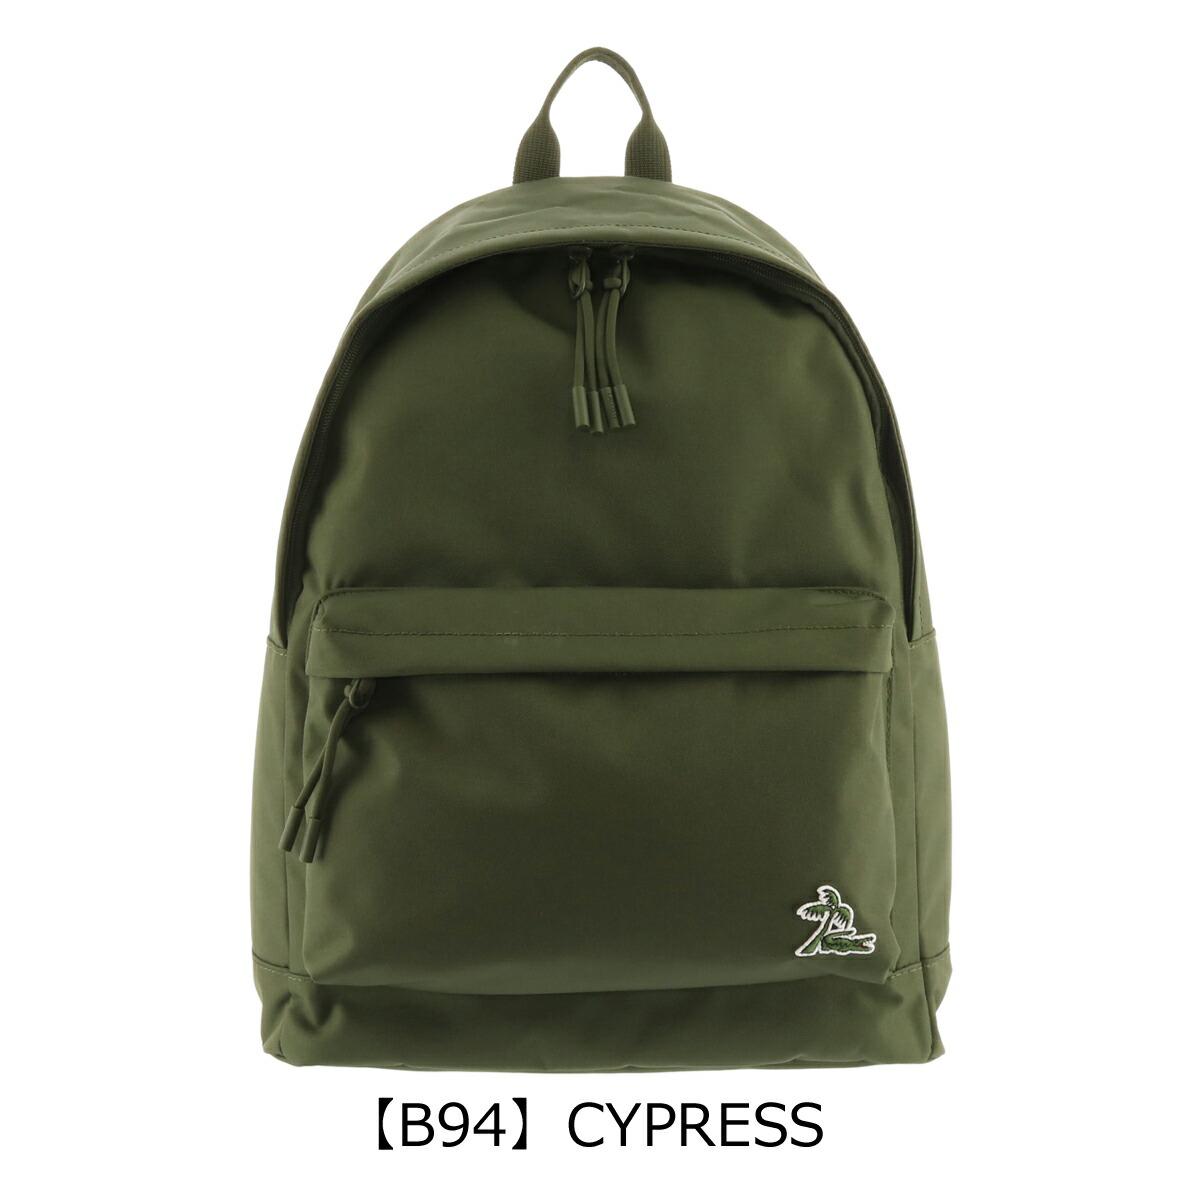 【B94】CYPRESS